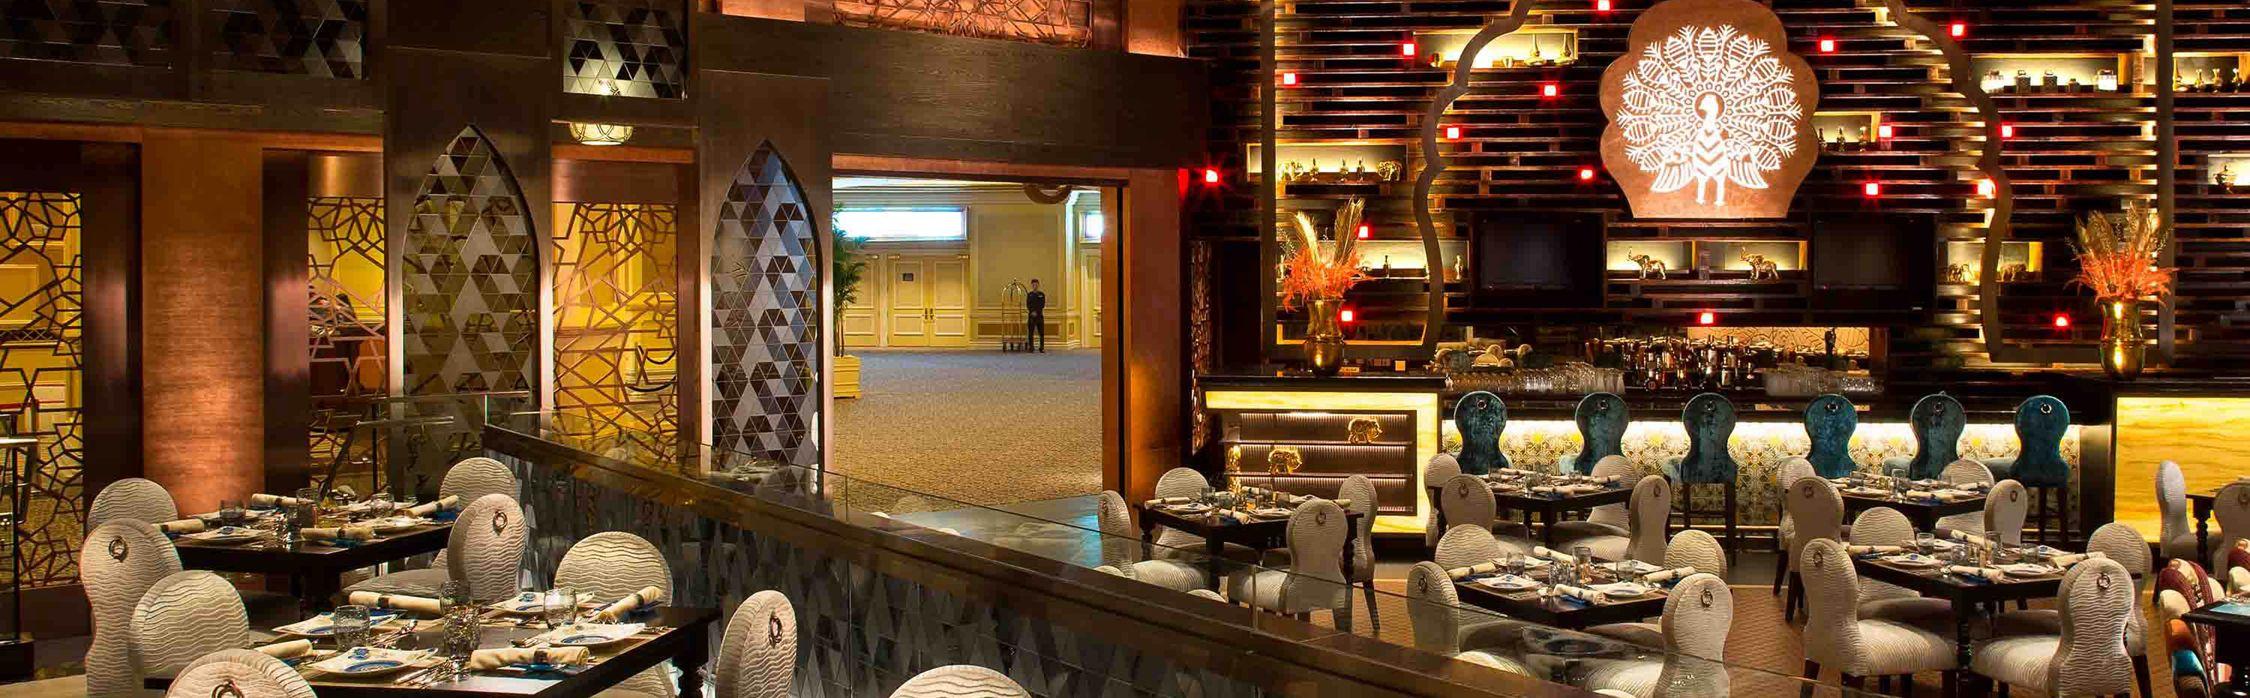 Golden pheonix hotel casino free chips for cirrus casino